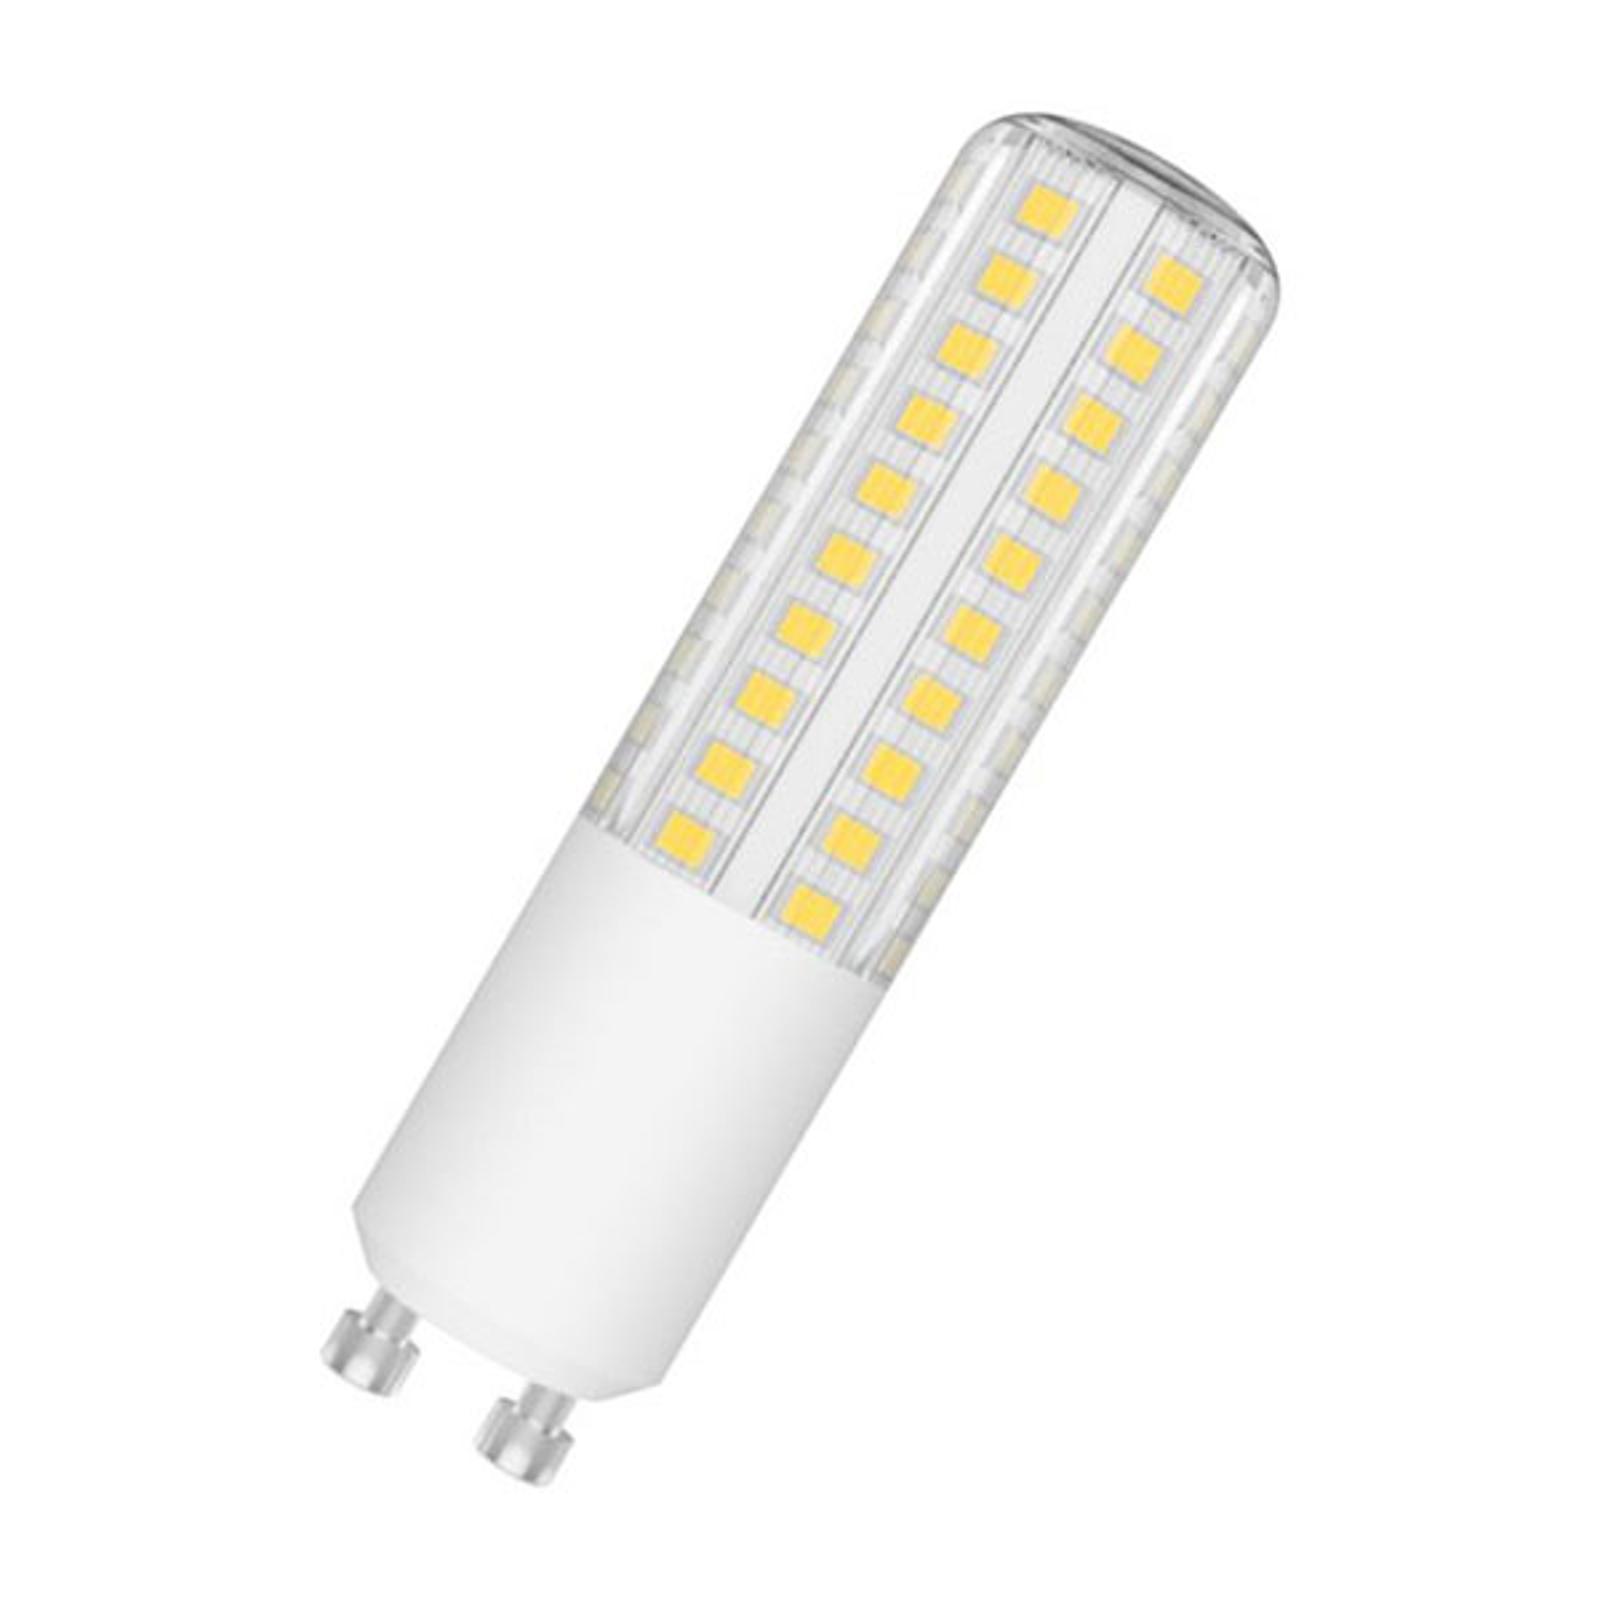 OSRAM LED-Lampe Special T GU10 7,5W 2.700K dimmbar